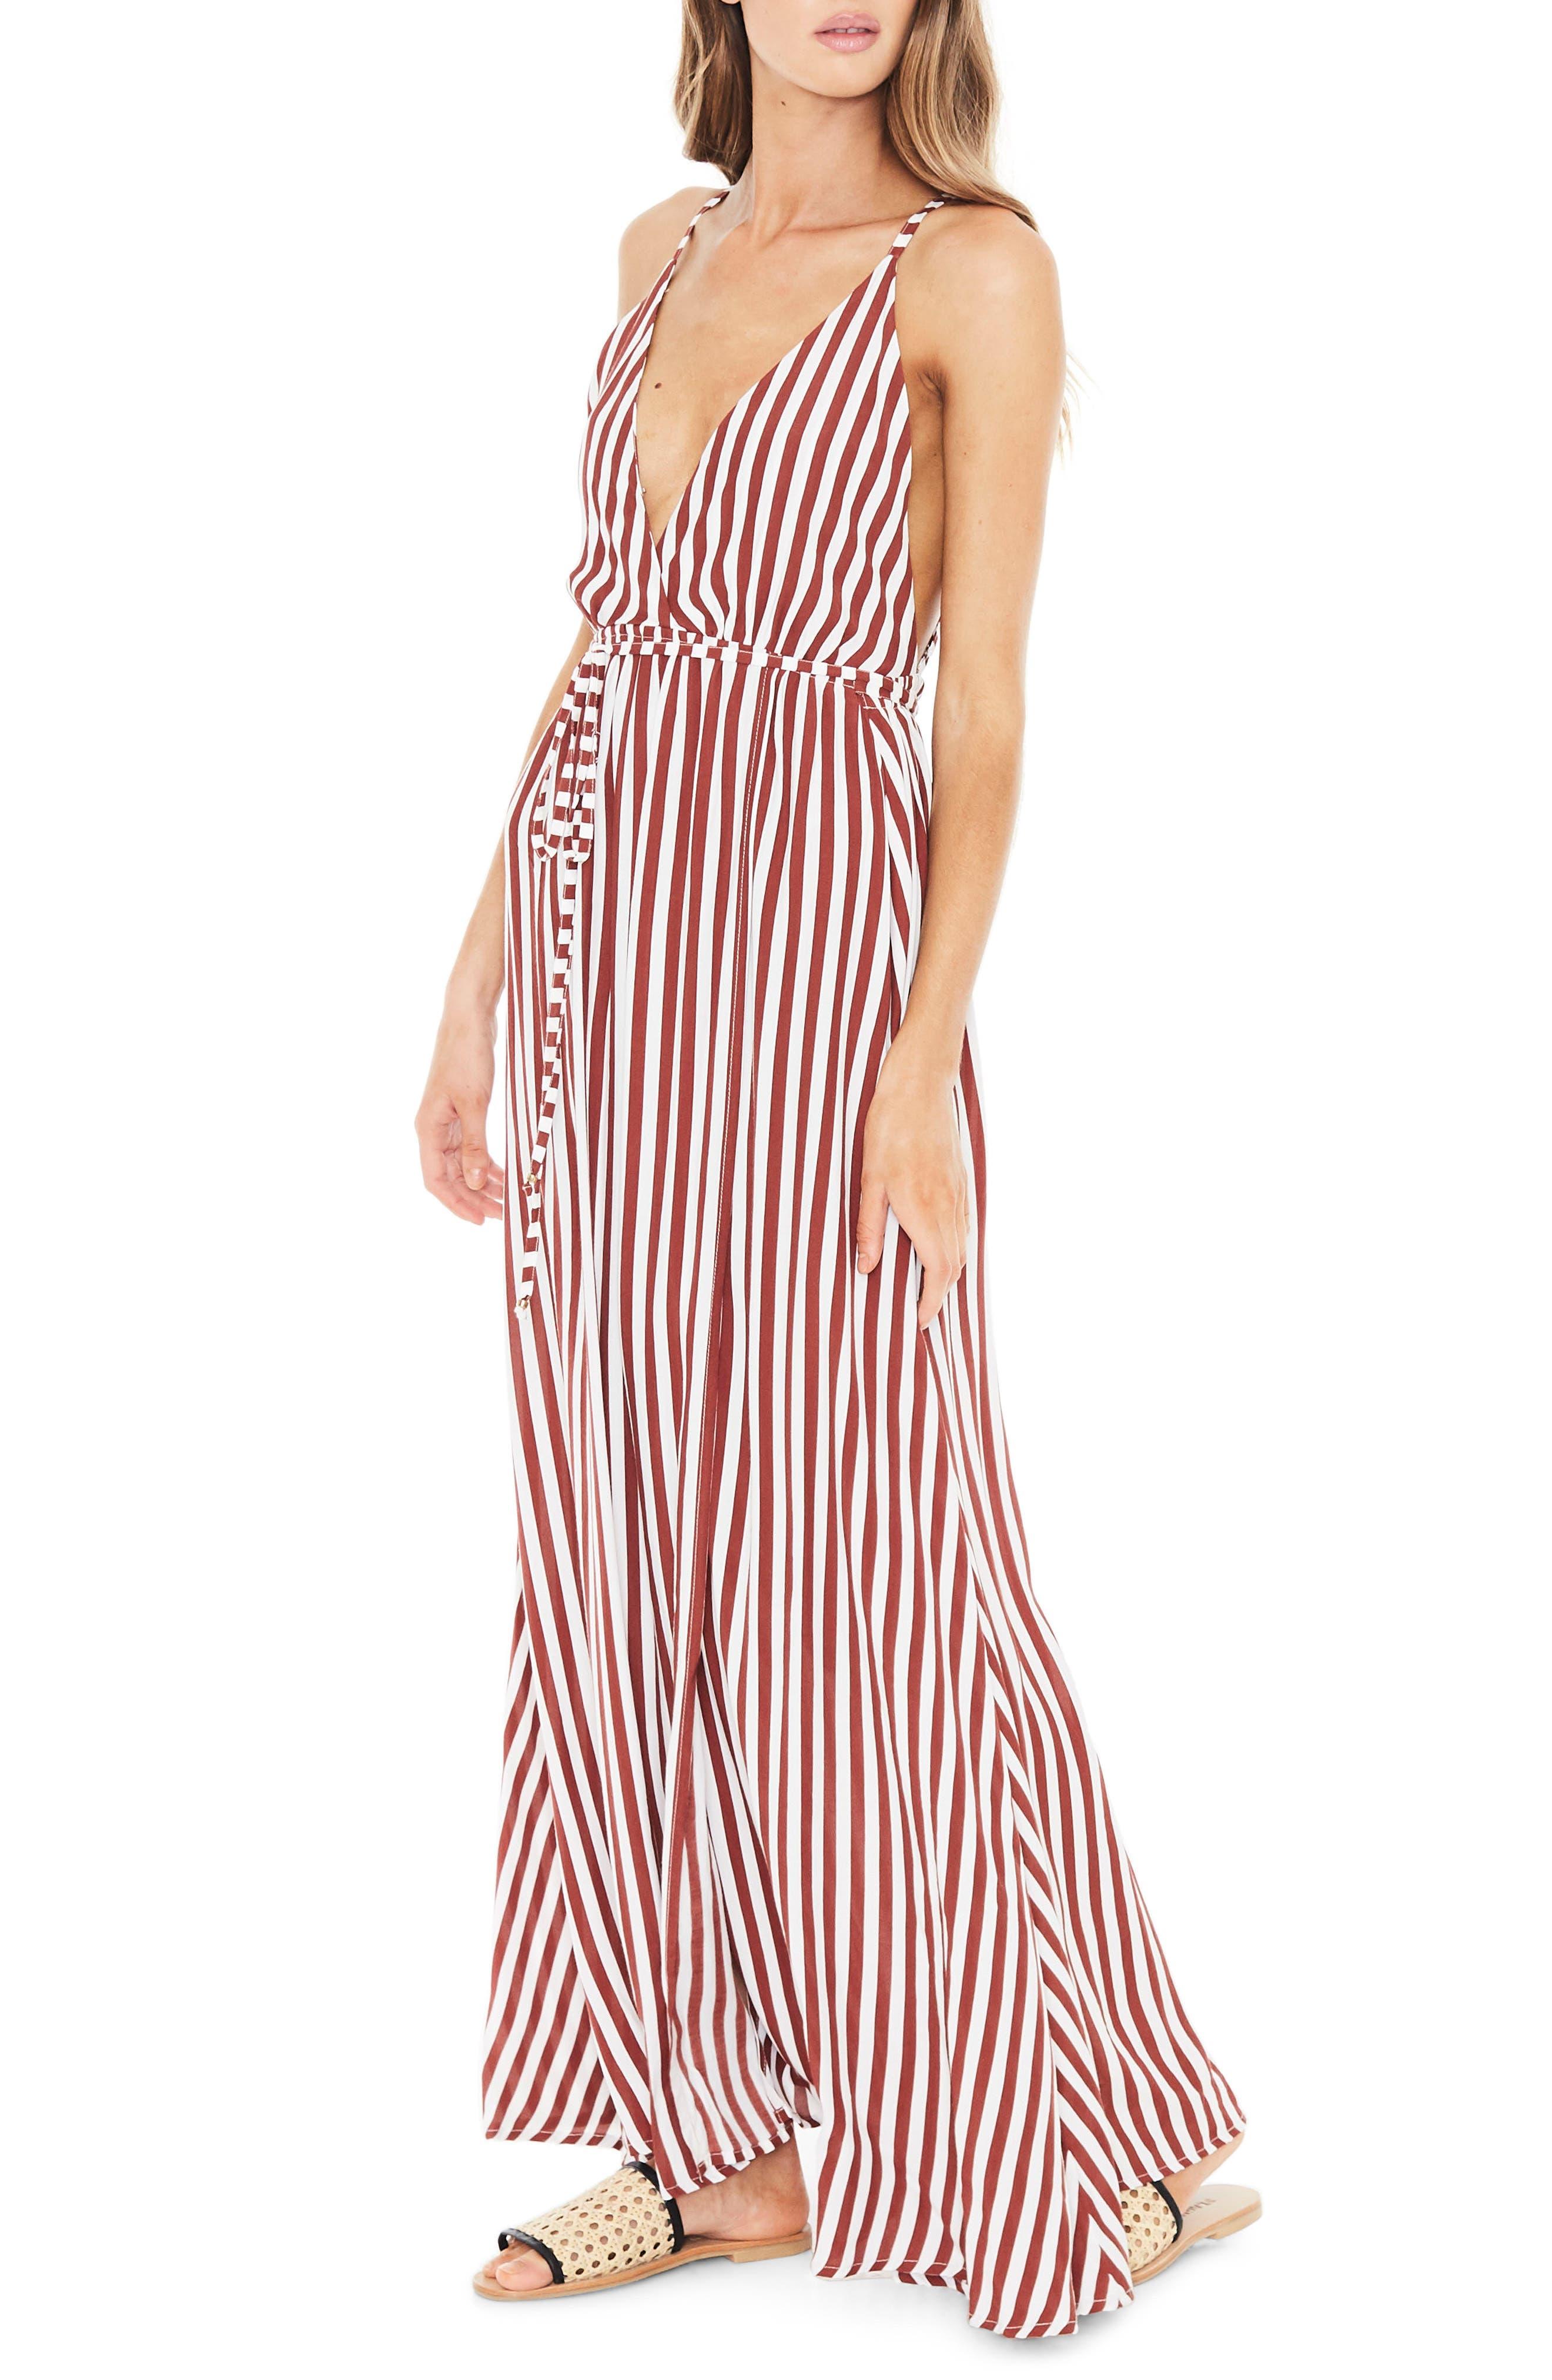 Santa Rosa Maxi Dress,                             Alternate thumbnail 3, color,                             Zeus Stripe Prints - Maroon